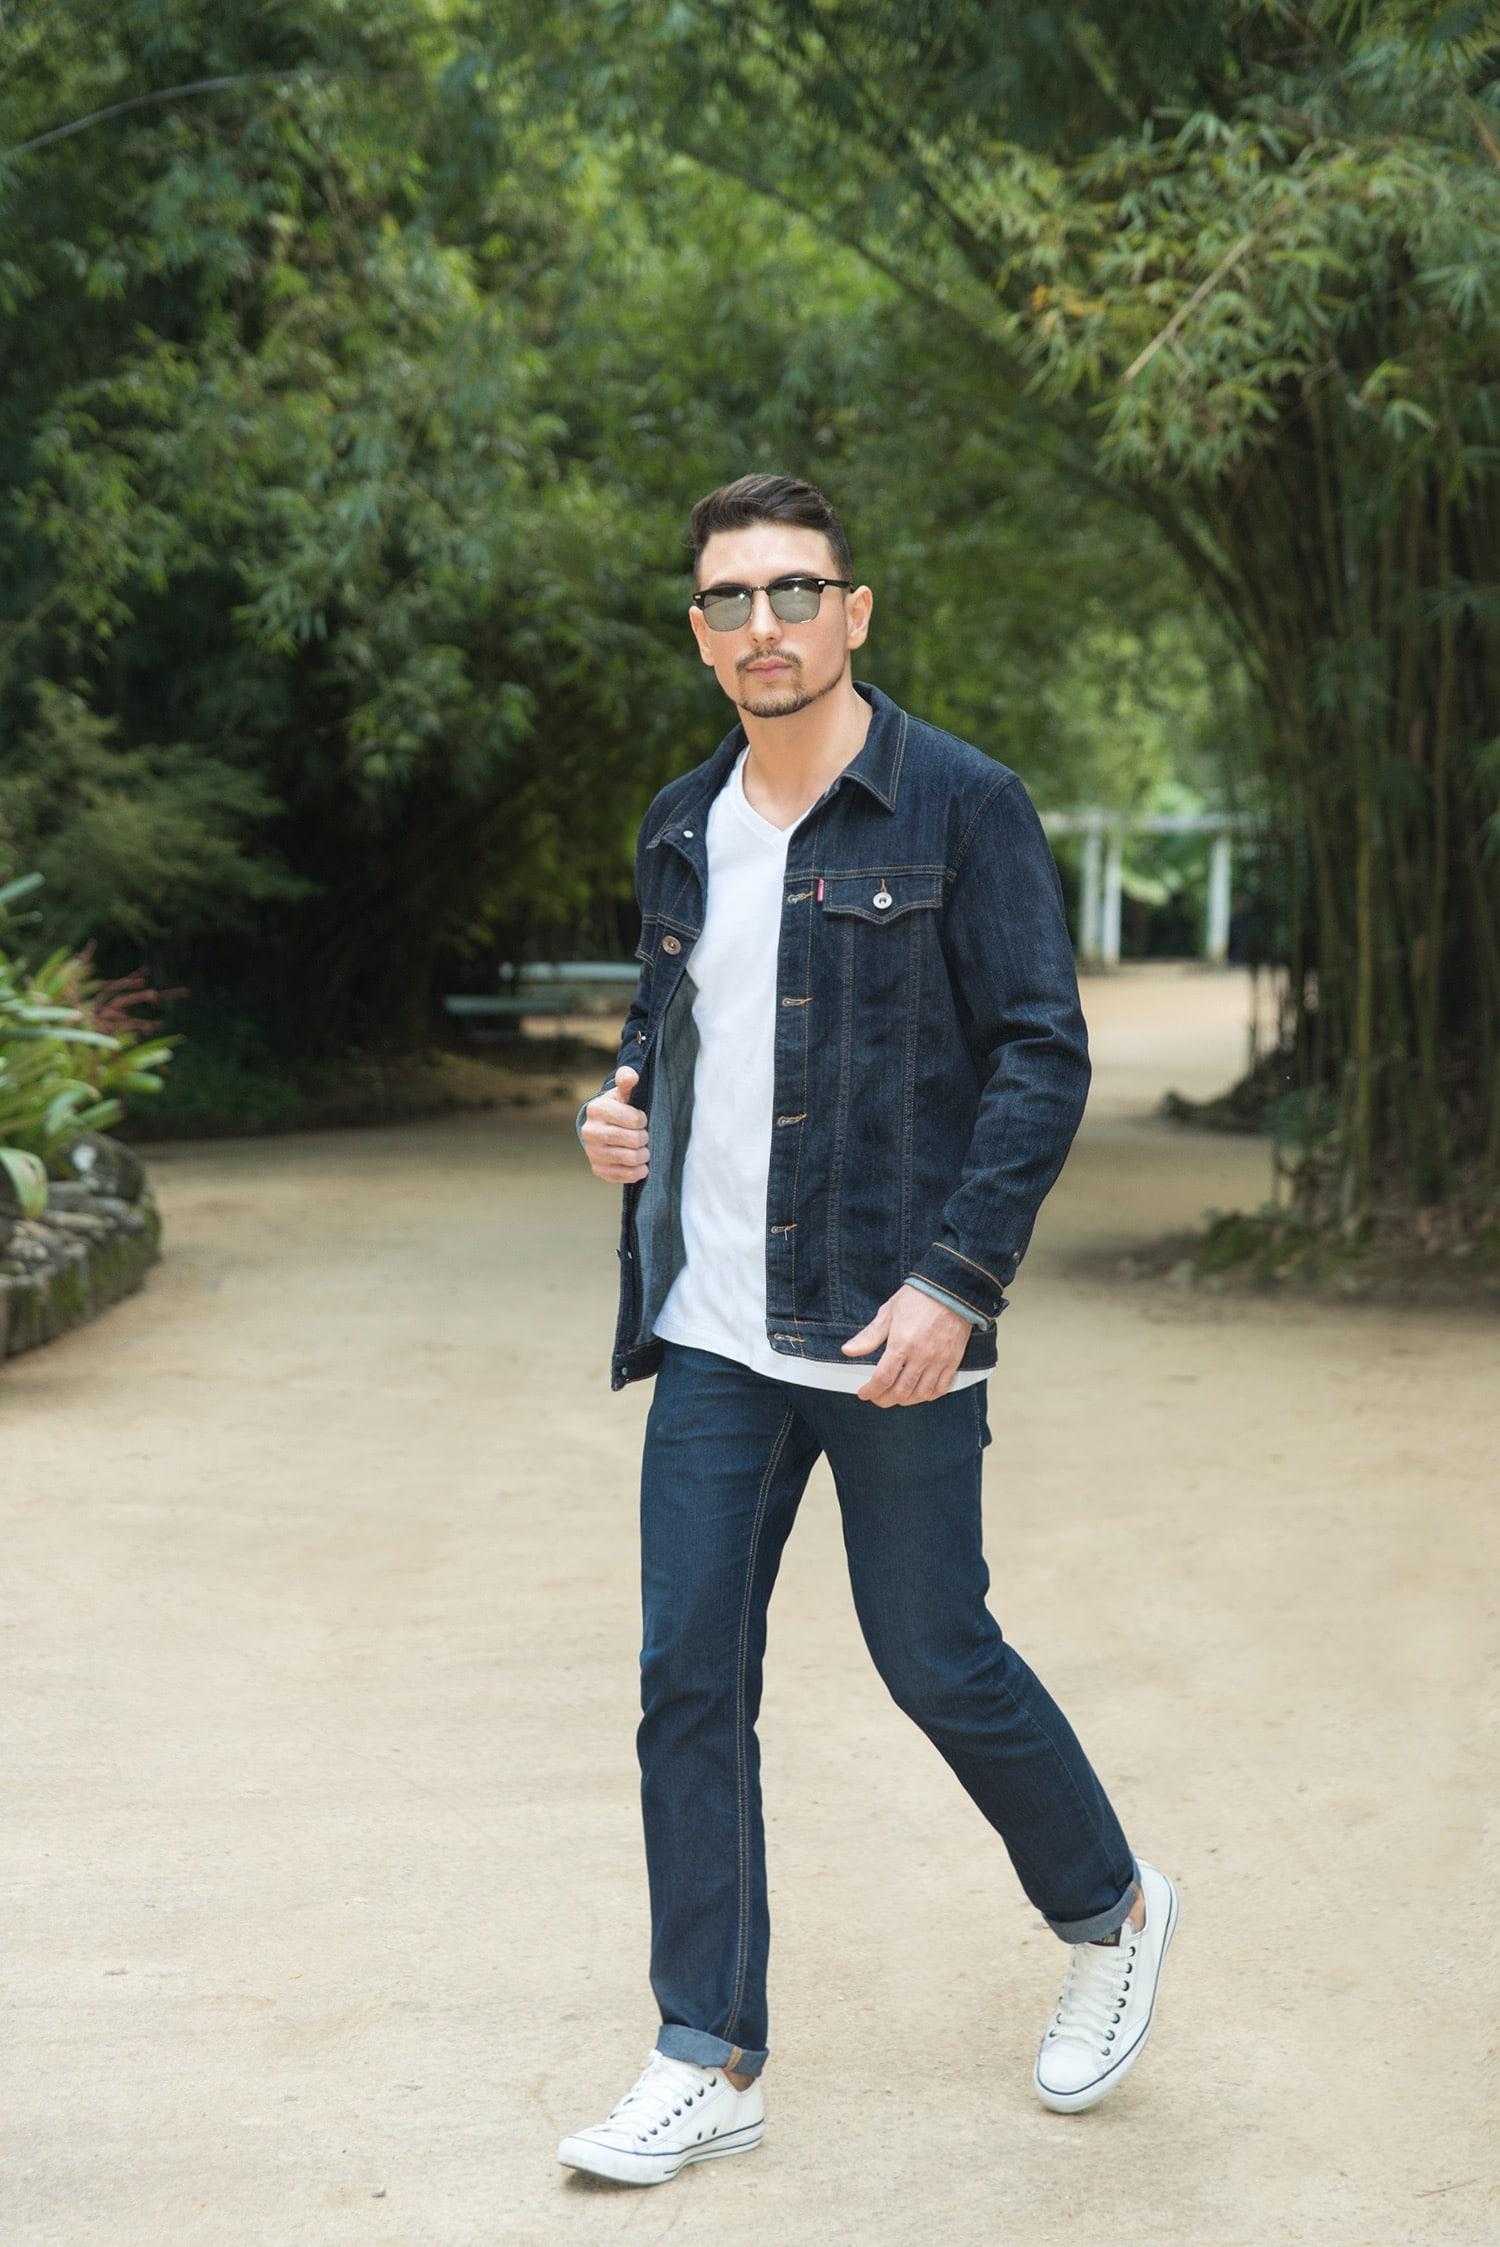 2 Juan alves Estilo HQSC jaqueta jeans e bolso estampado